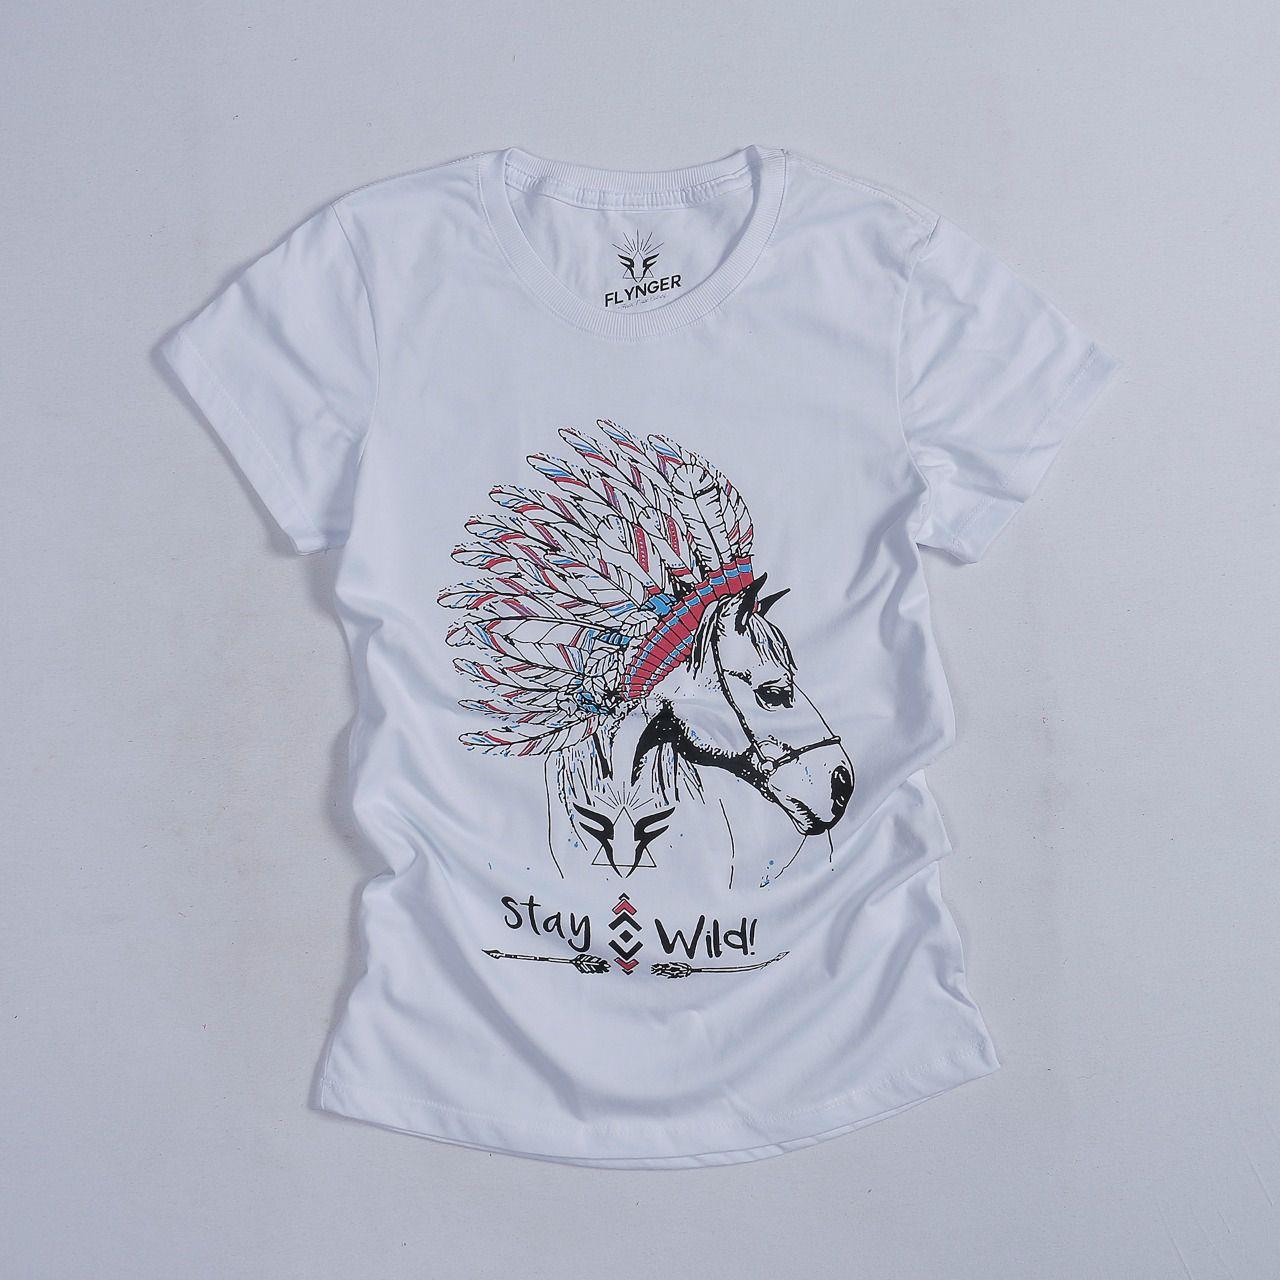 Babylook Horse Wild Flynger fly-131